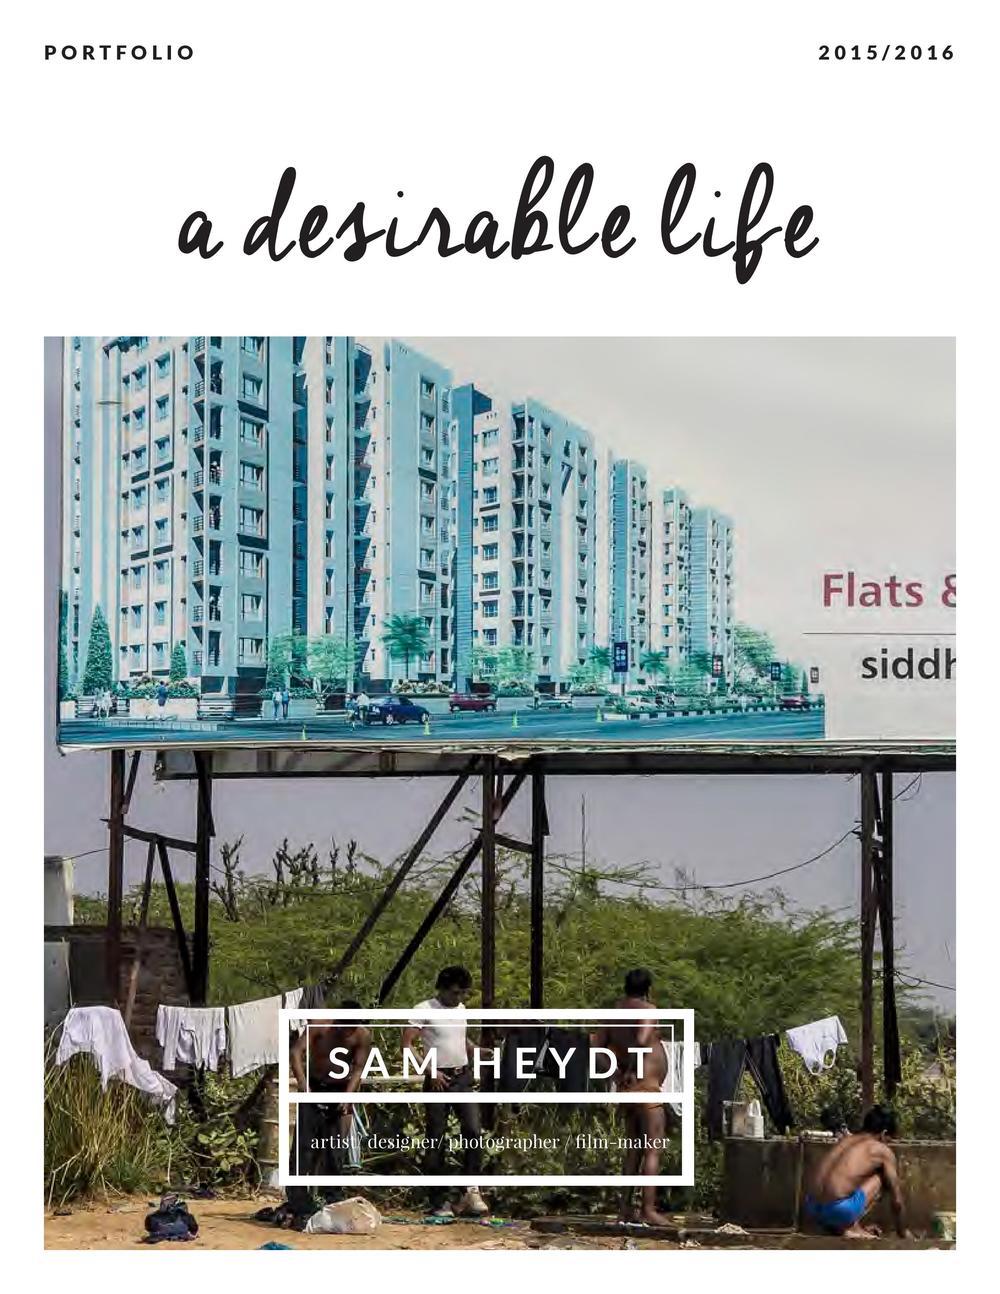 DesirableLife-Catalog-HEYDT-email-page-001.jpg